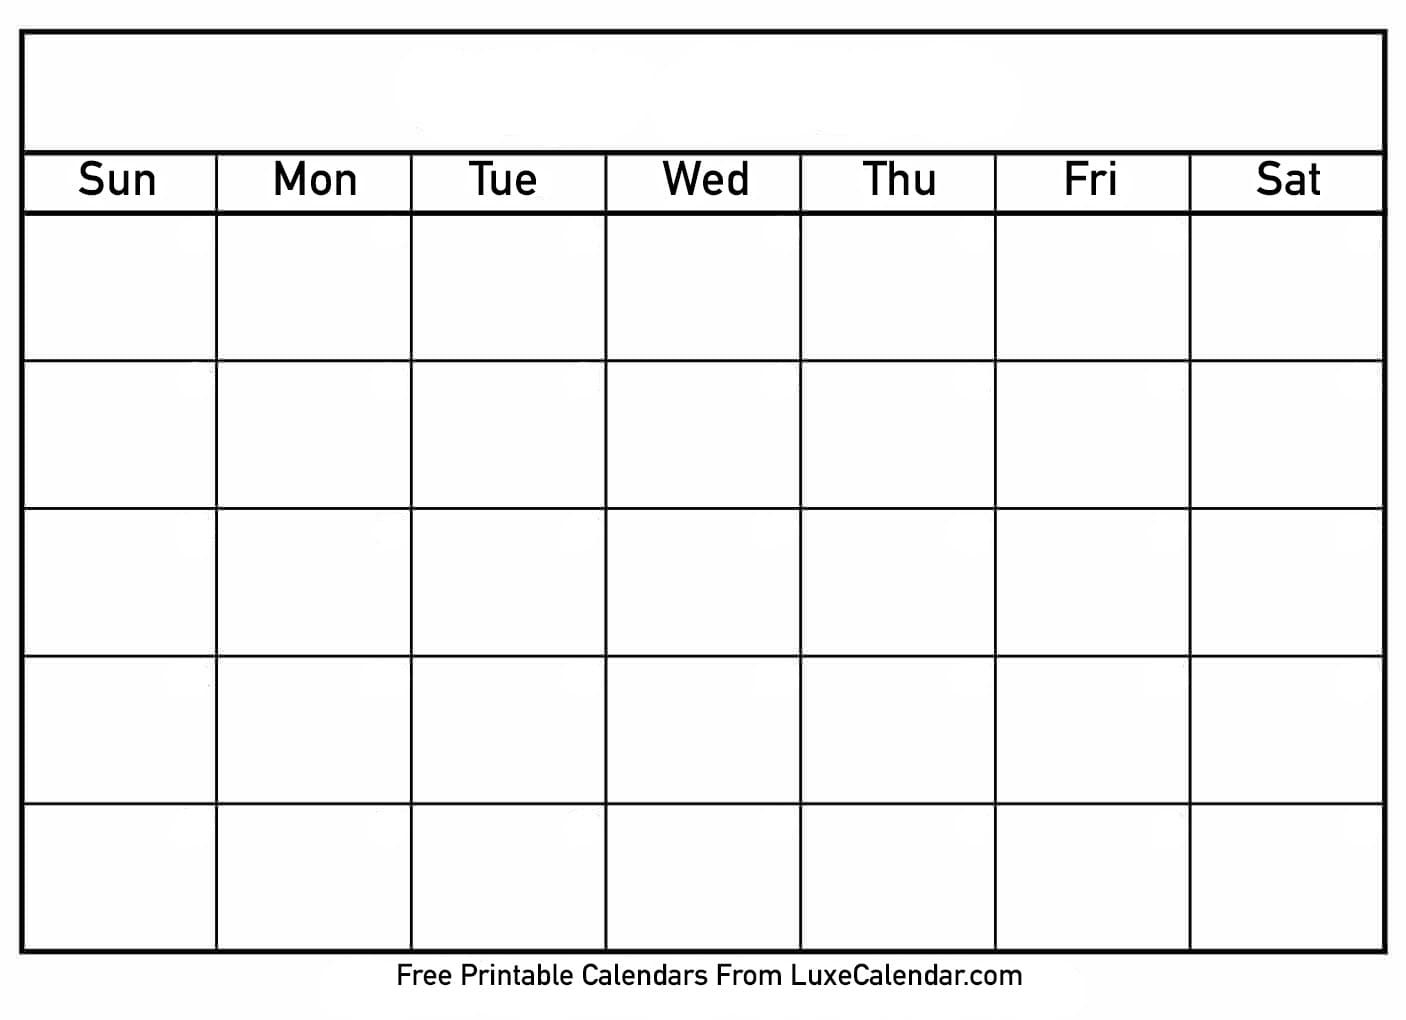 Blank Printable Calendar - Luxe Calendar  Printable Fill In Calendar Temoplate